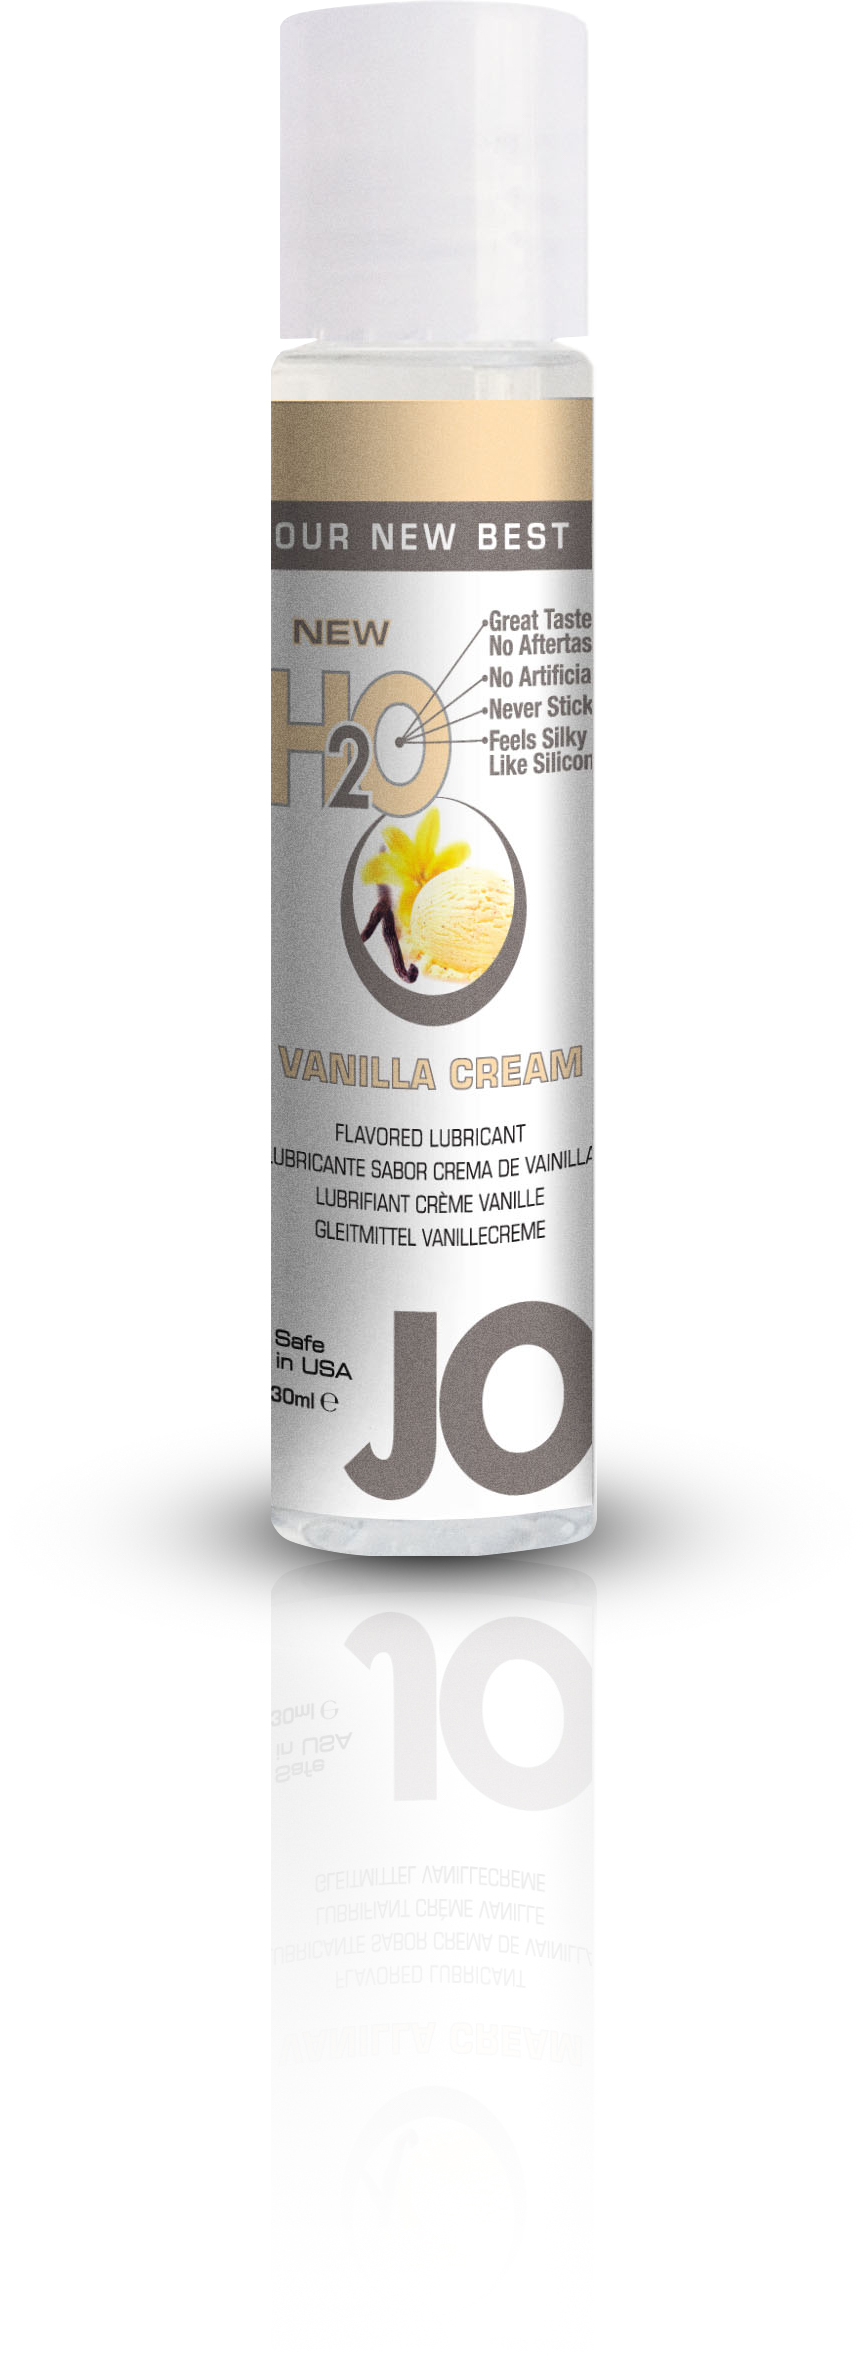 30384_JO_h2o_flavored_lubricant_1oz_1oz_vanilla.jpg